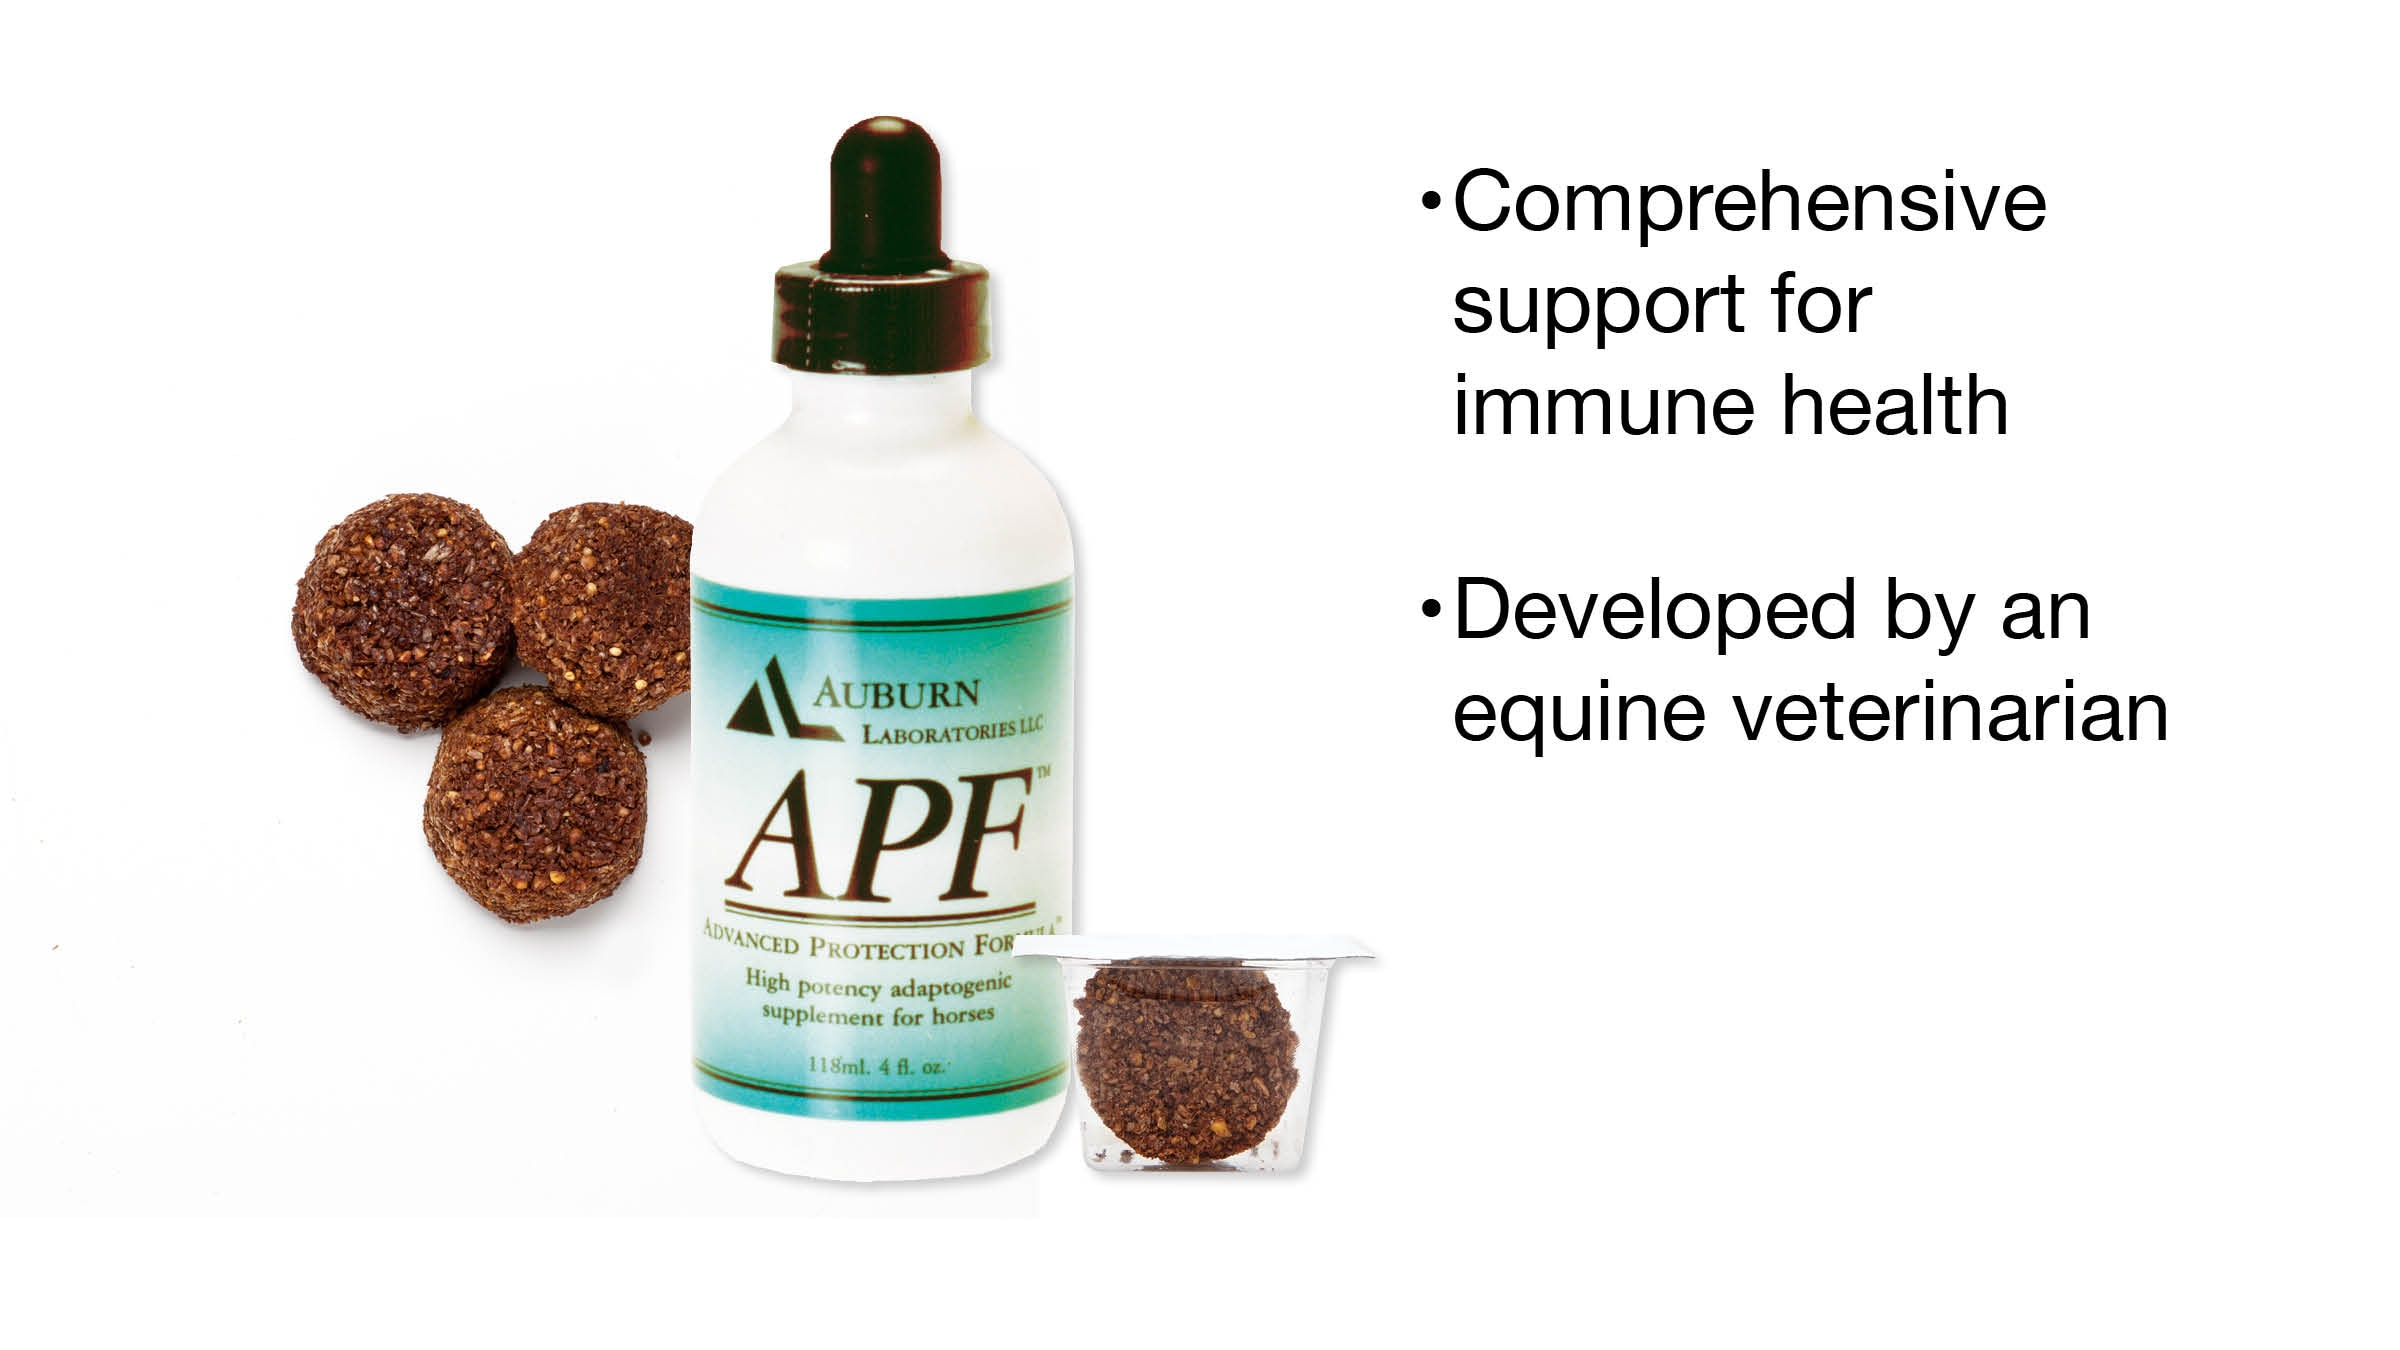 120 Ml Bottle Auburn Laboratories Apf Pro Equine Business & Industrial